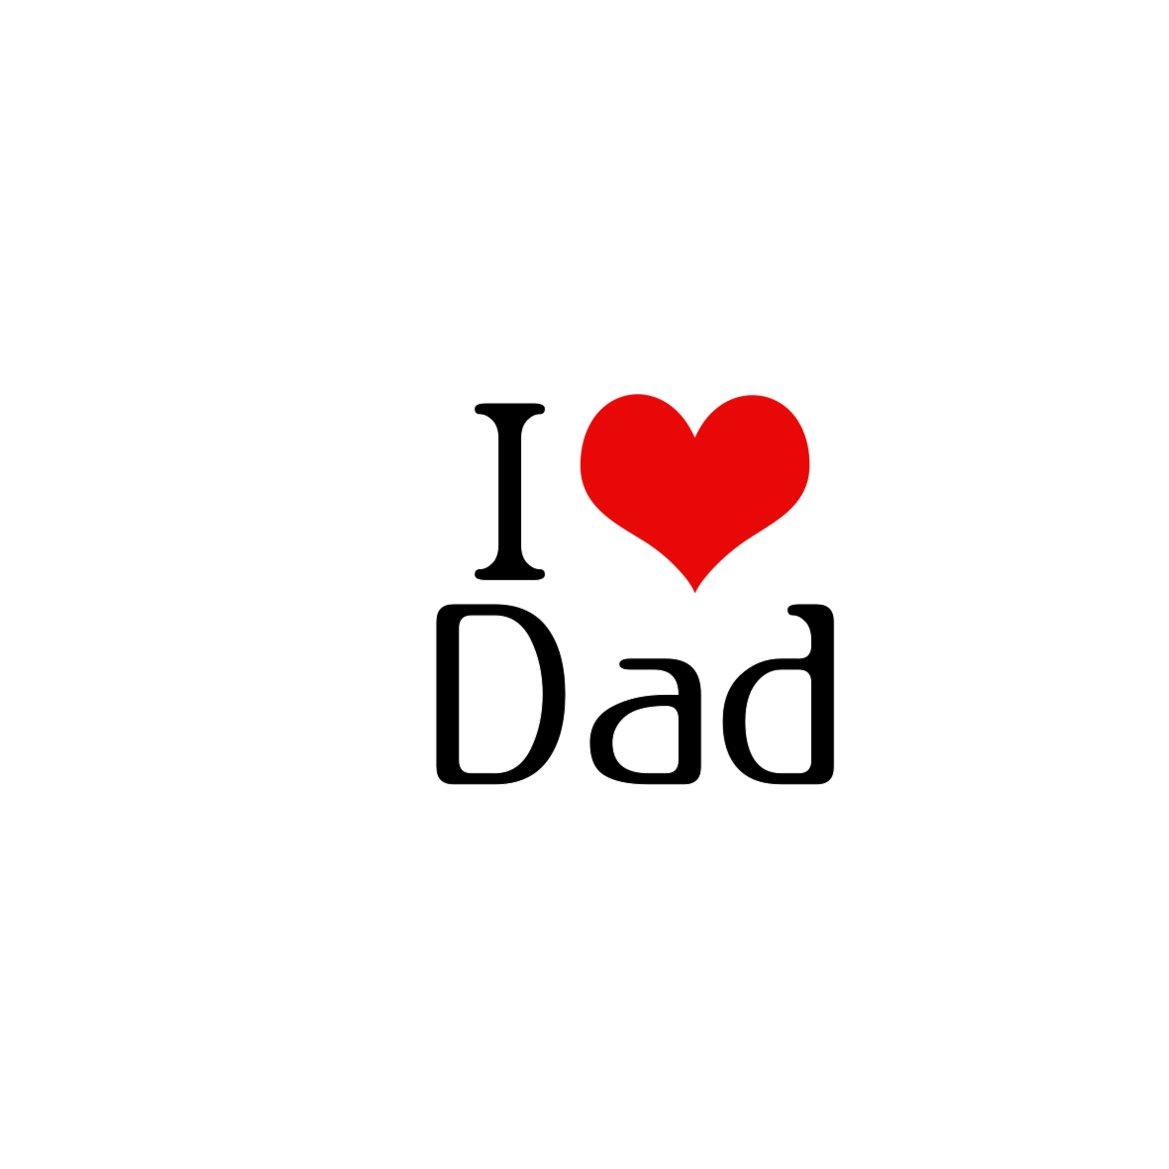 Dad Love 21339 Hd Wallpapers in Love   Imagescicom 1169x1169